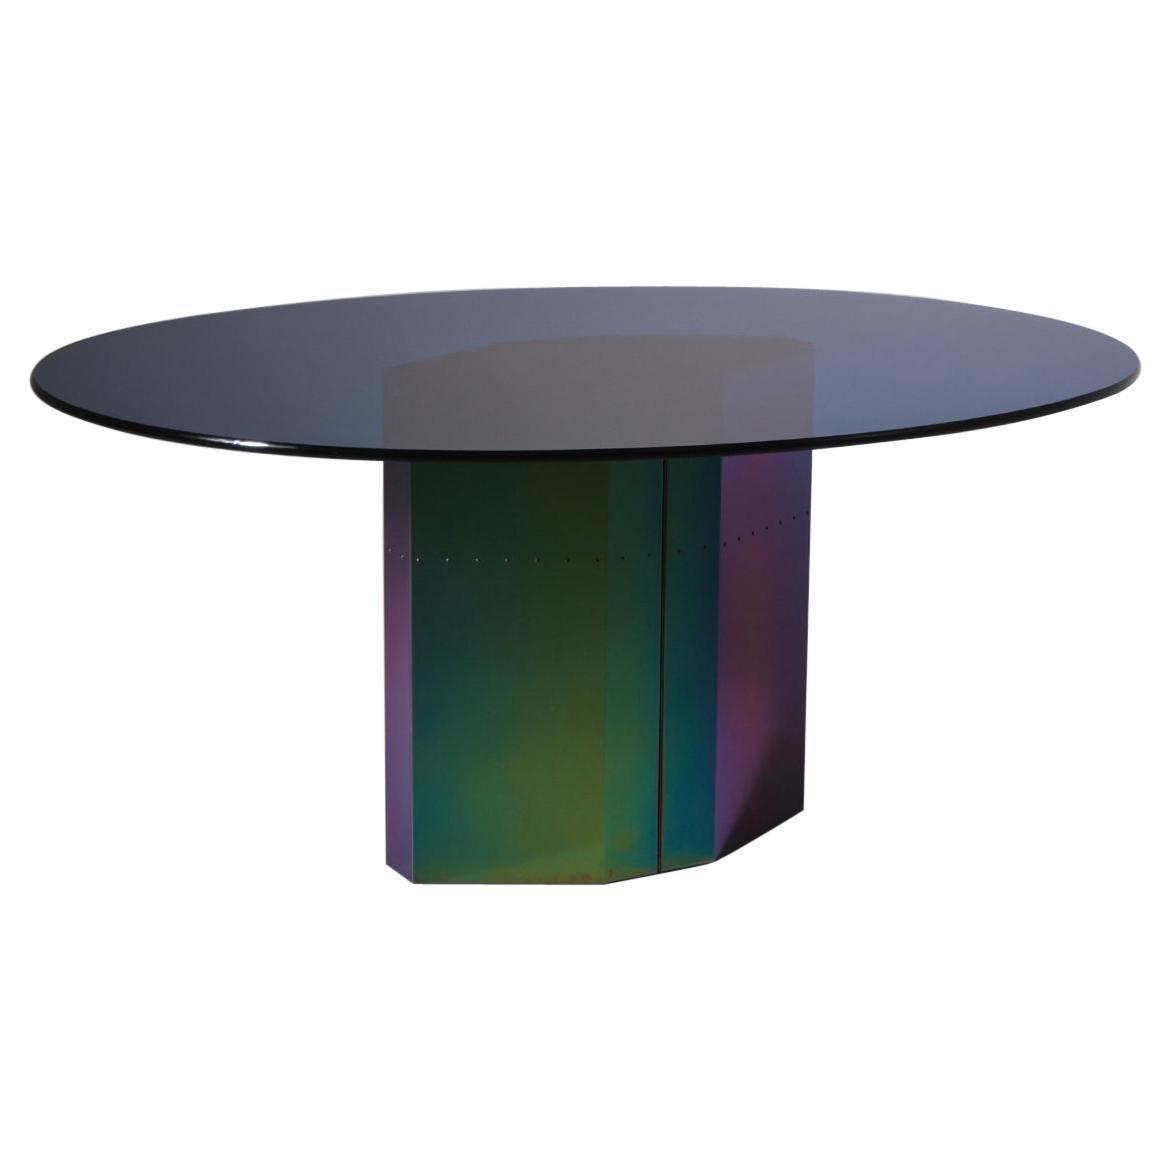 Afra & Tobia Scarpa 'Polygonon' Dining Table for B&B Italia